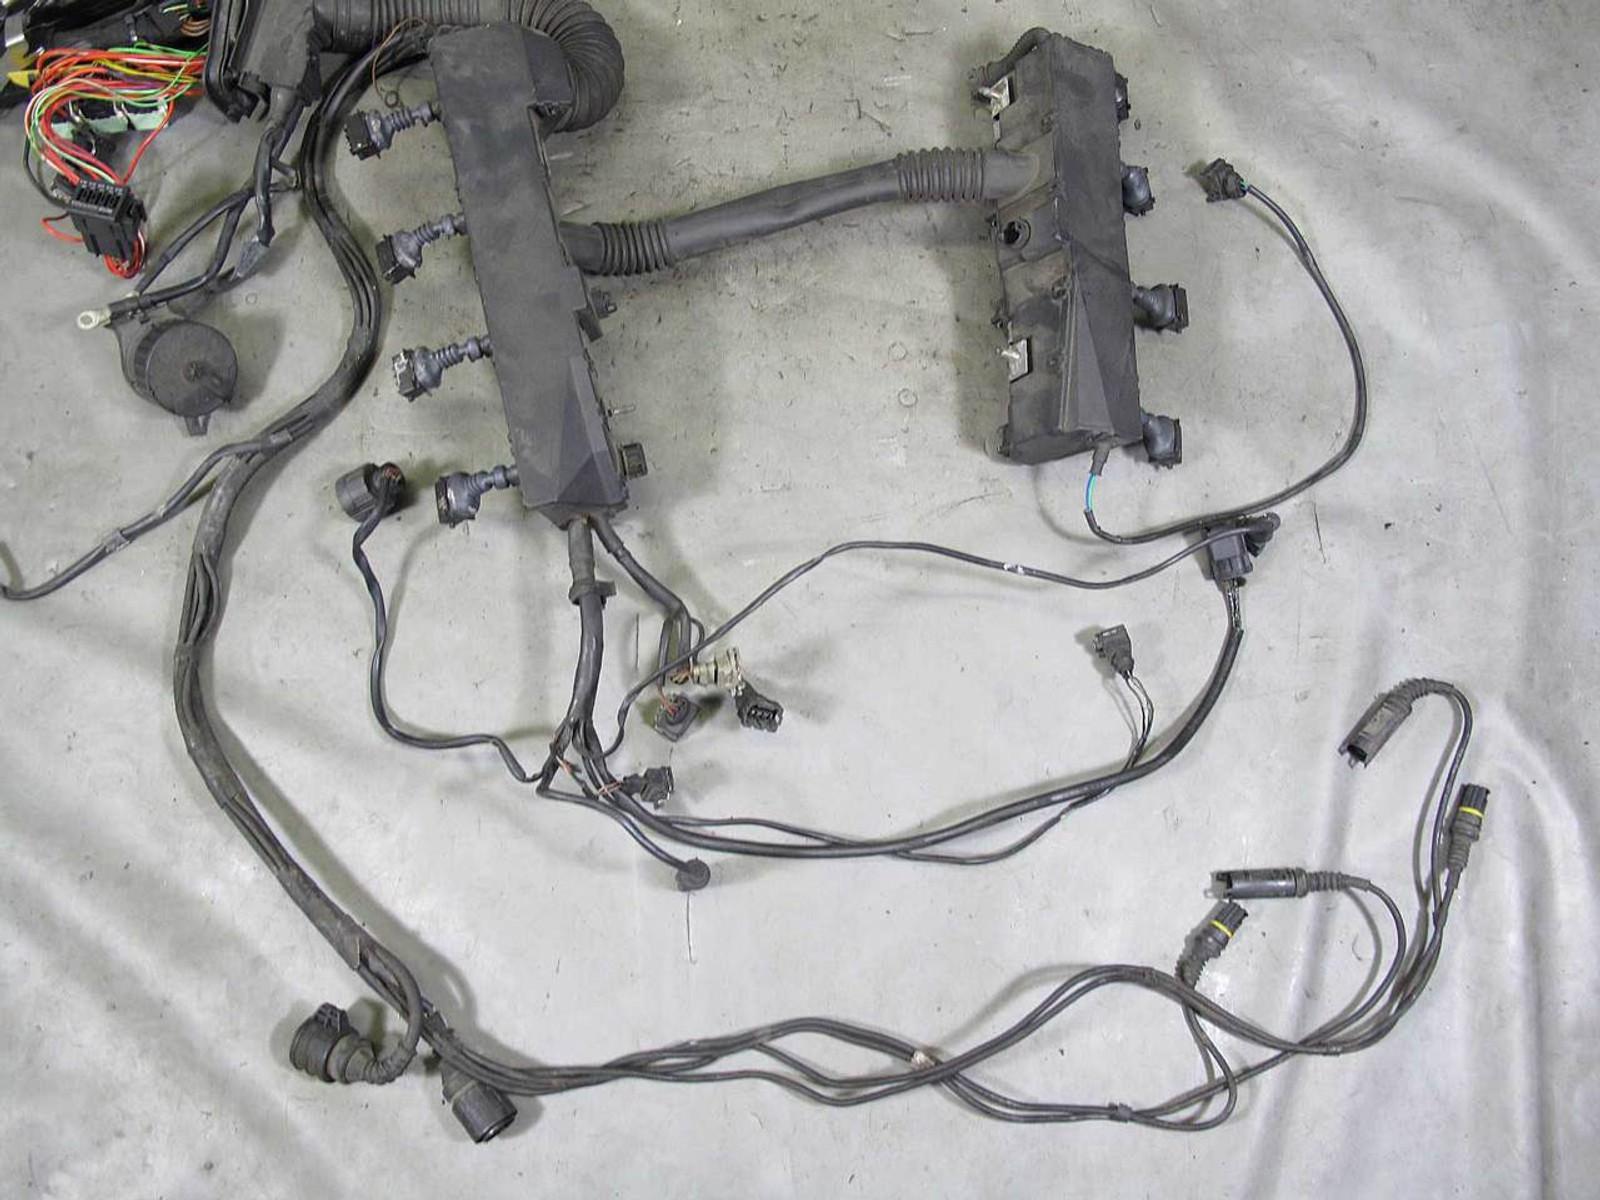 bmw 740il engine wiring harness wiring diagram bmw 740il engine wiring harness [ 1600 x 1200 Pixel ]